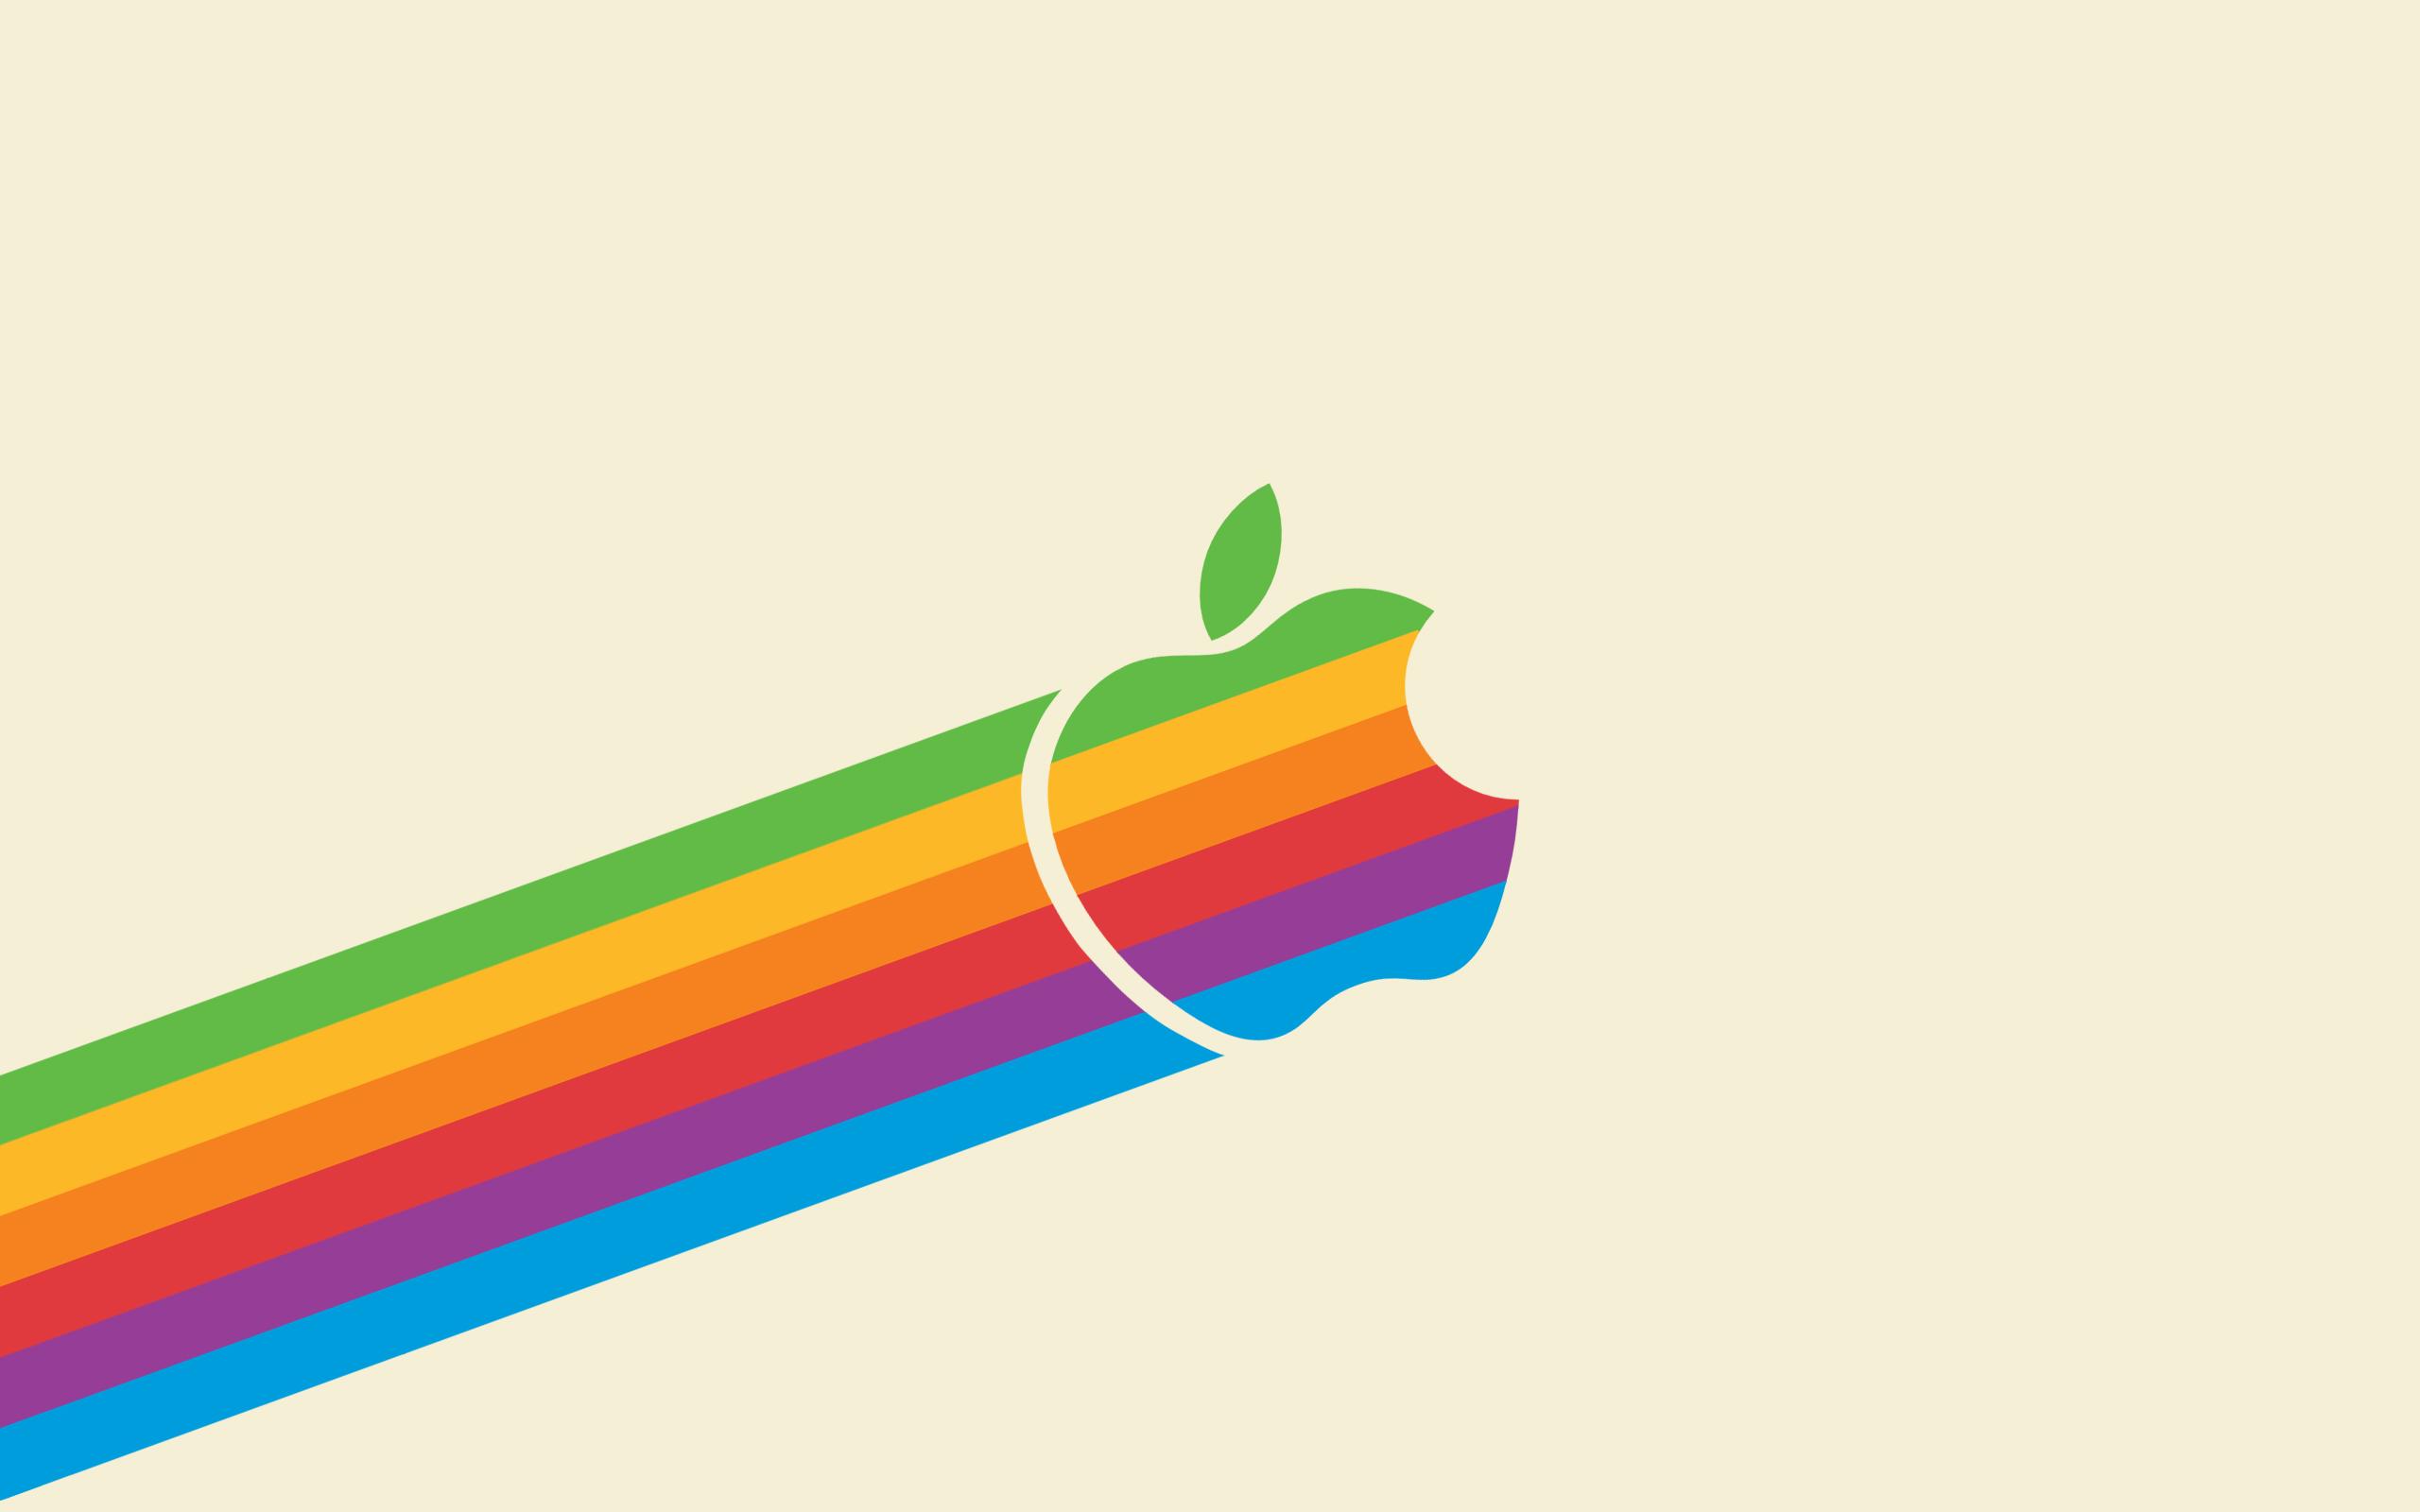 apple wallpaper hd,line,colorfulness,graphic design,graphics,diagram